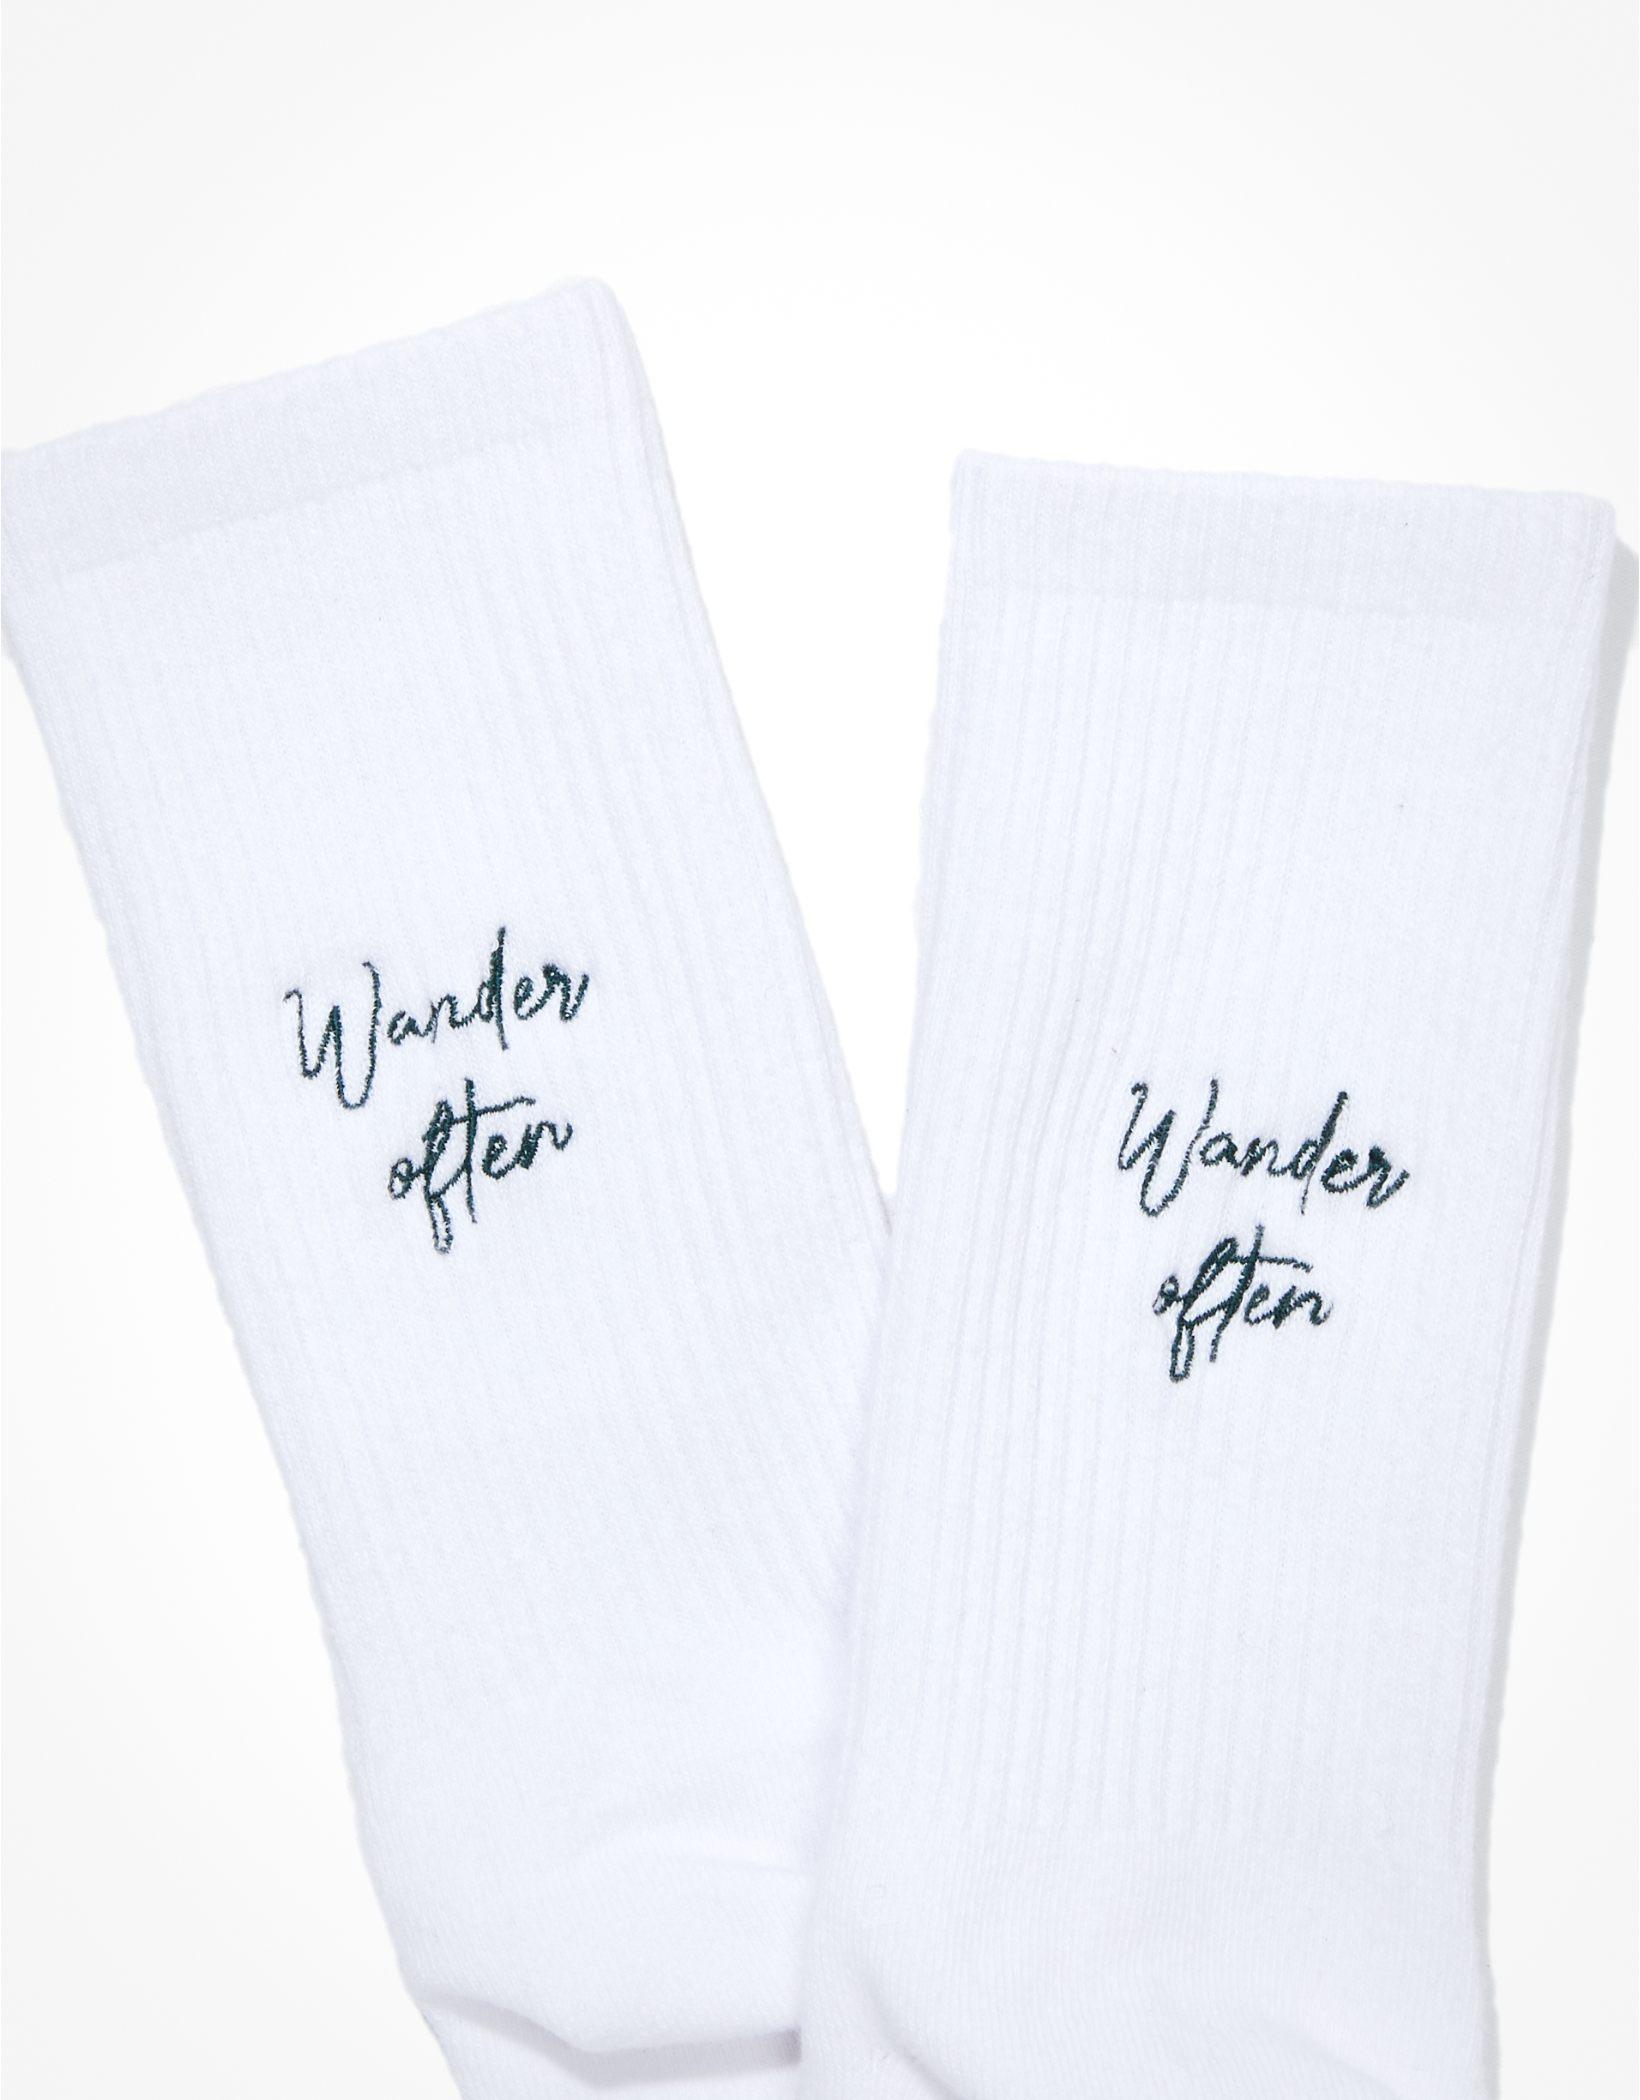 AE Wander Often Dad Sock